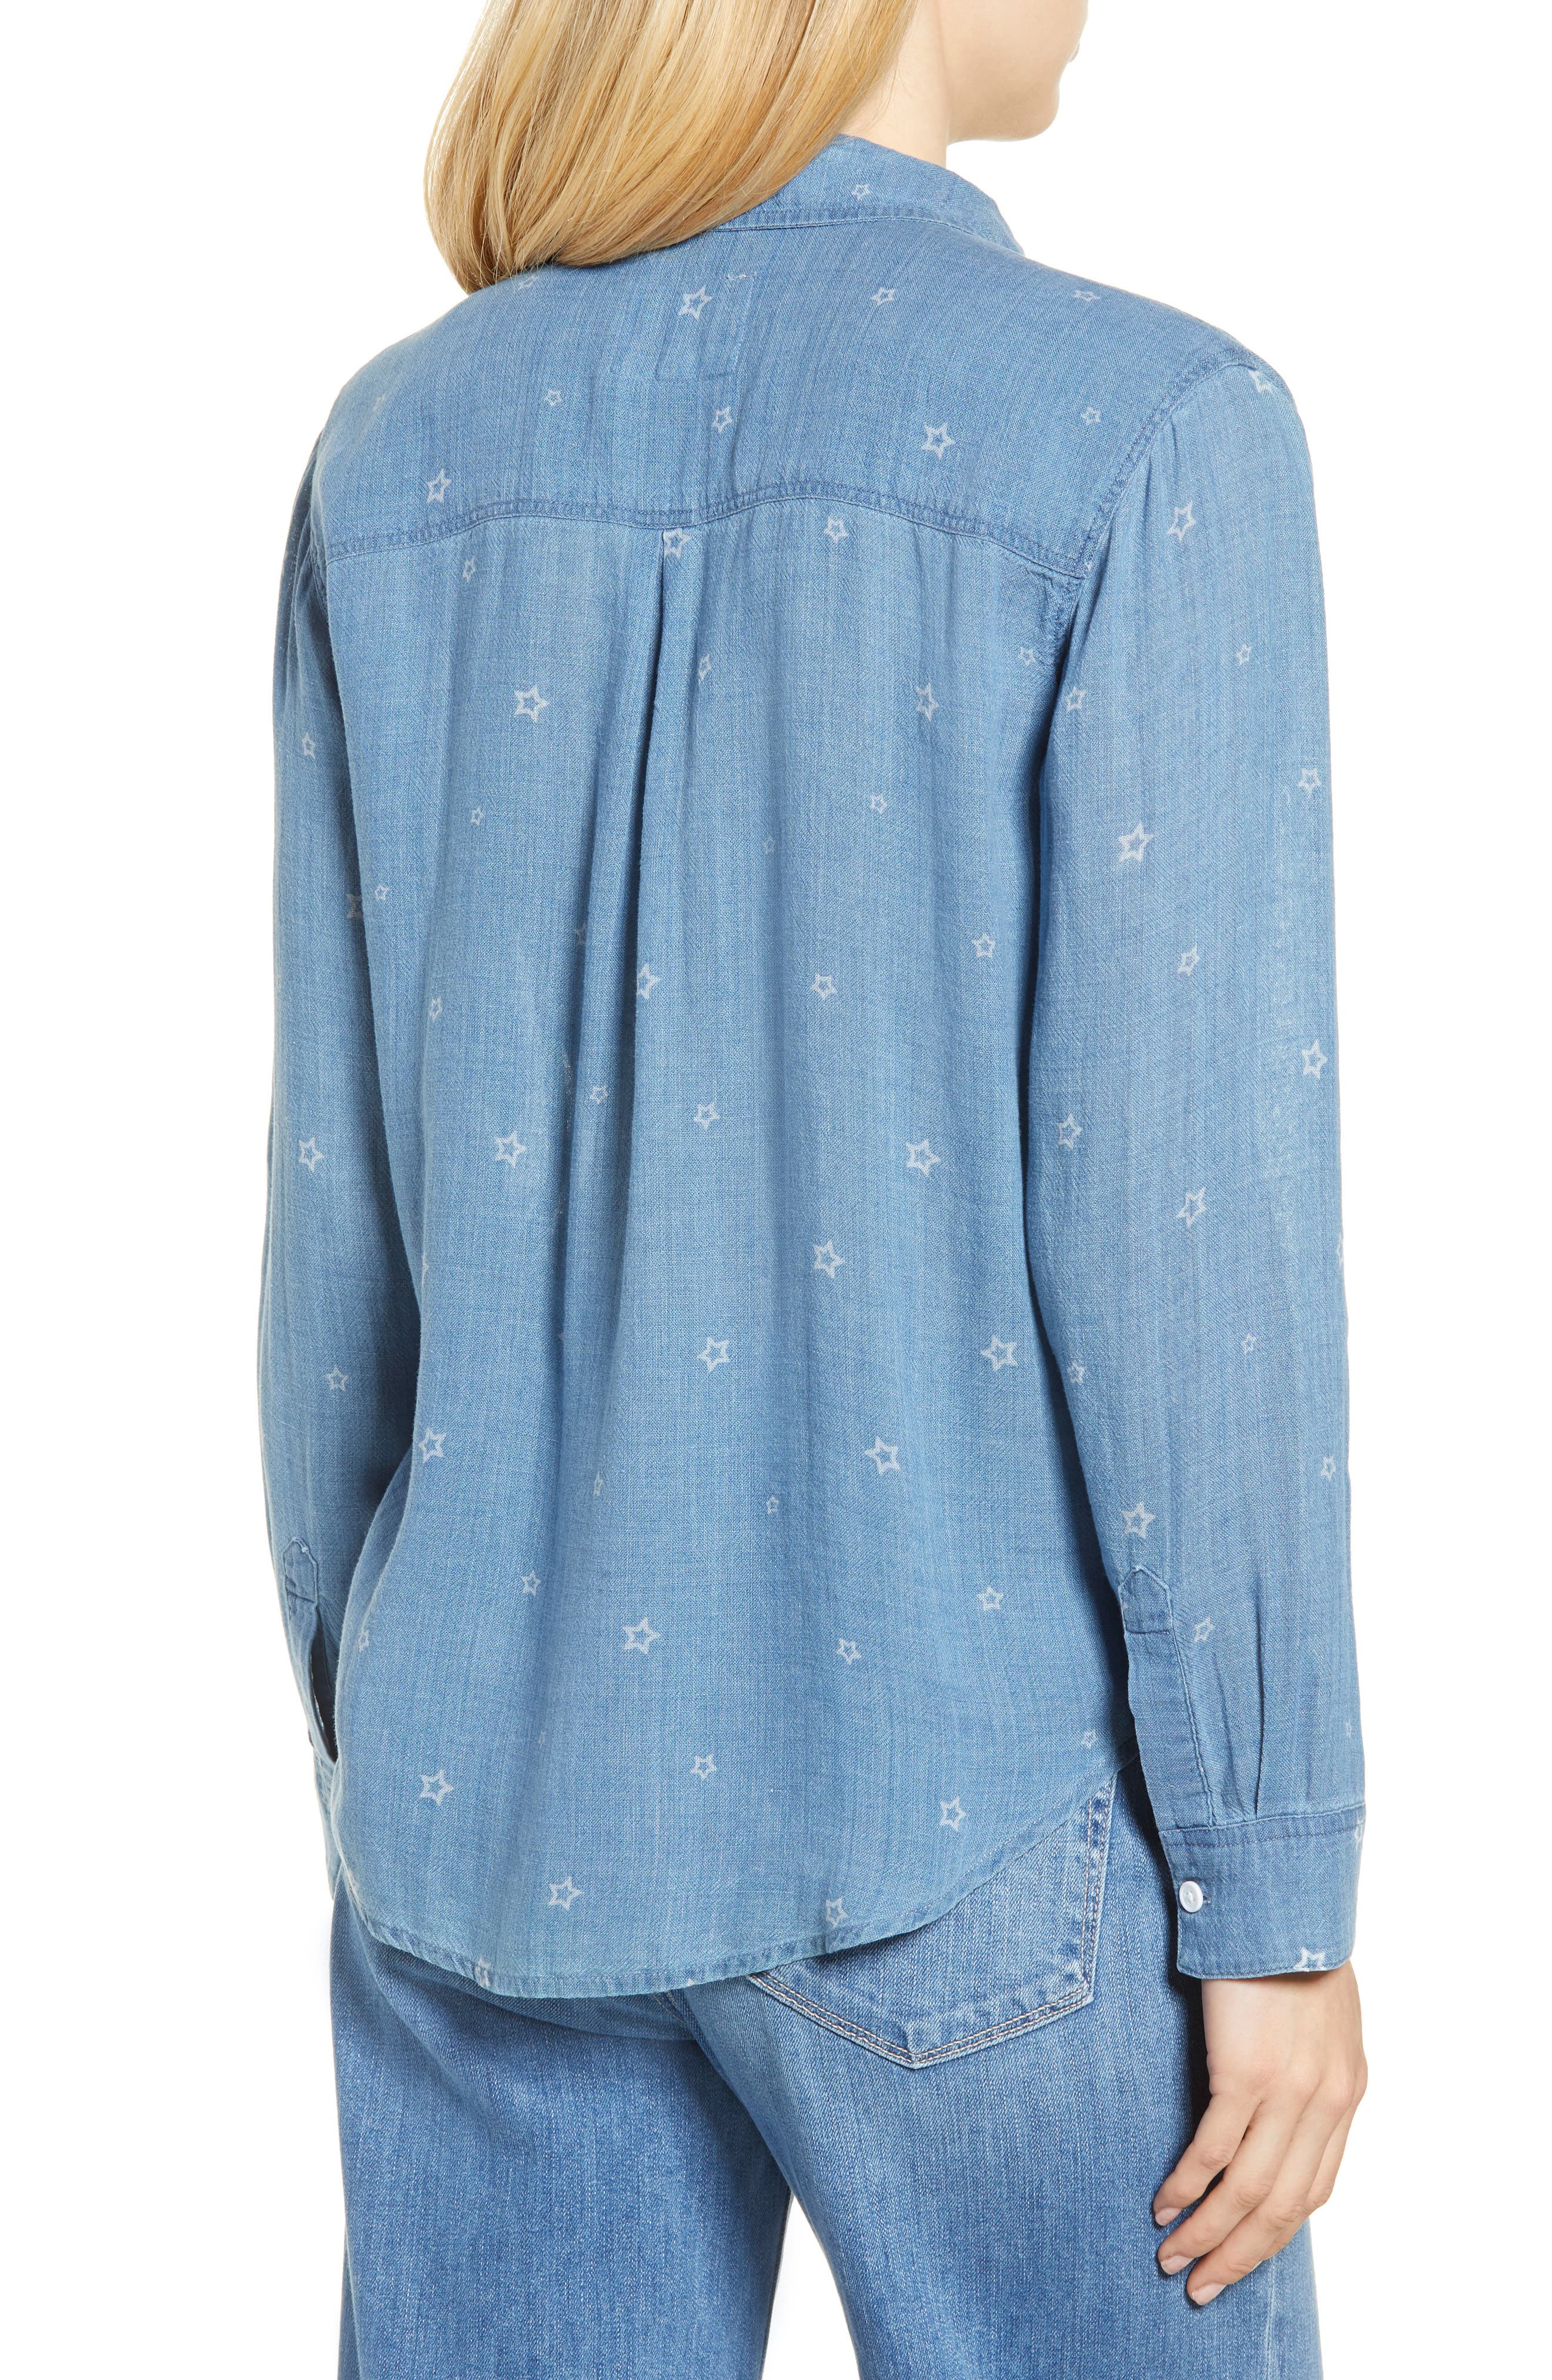 Ingrid Chambray Shirt,                             Alternate thumbnail 2, color,                             INDIGO STARS